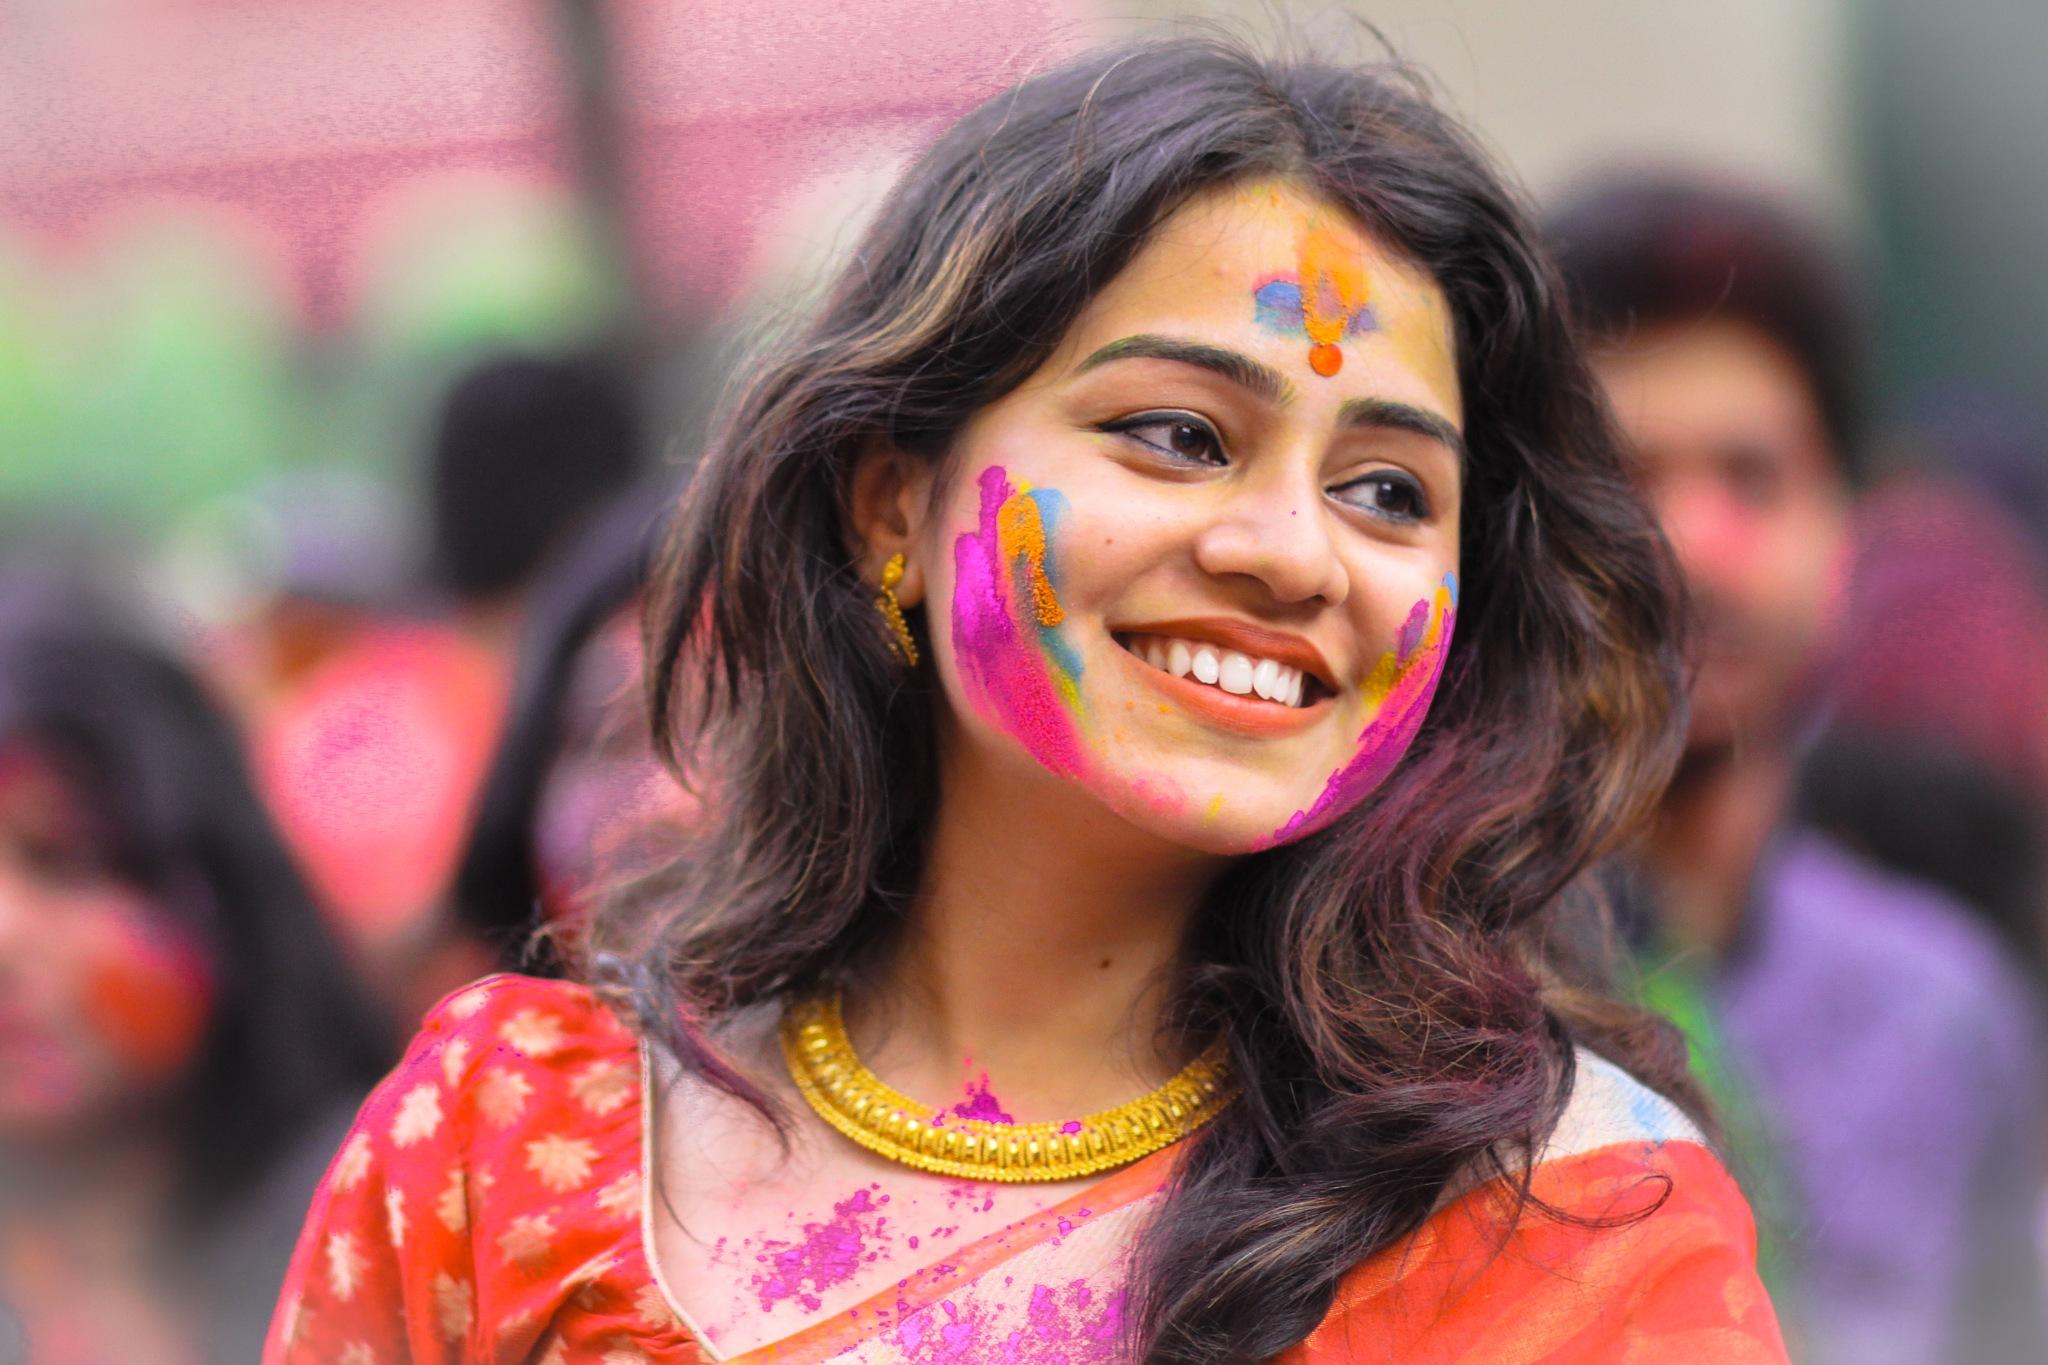 holi celebration by Suvam Saha